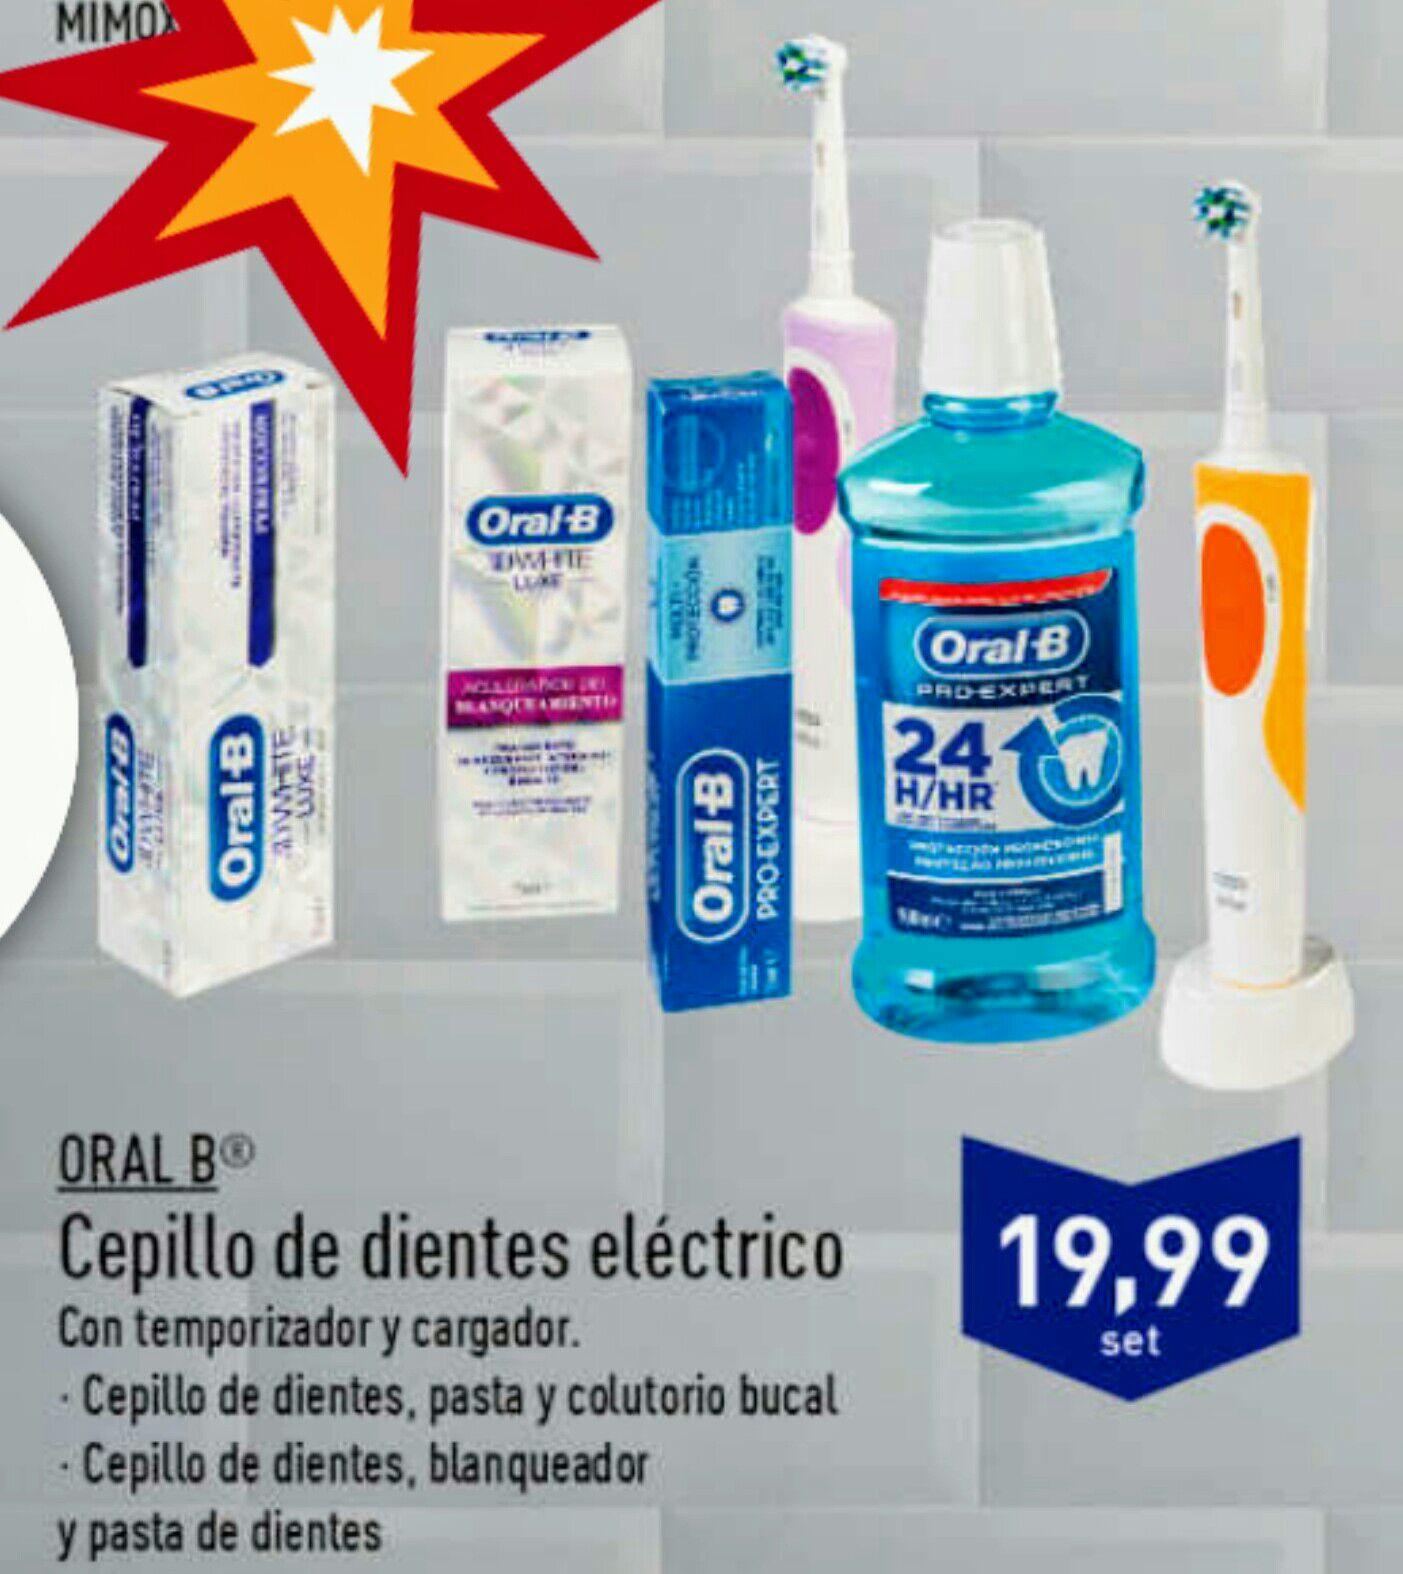 PACK Braun Oral B - Cepillo dientes eléctrico + pasta + colutorio